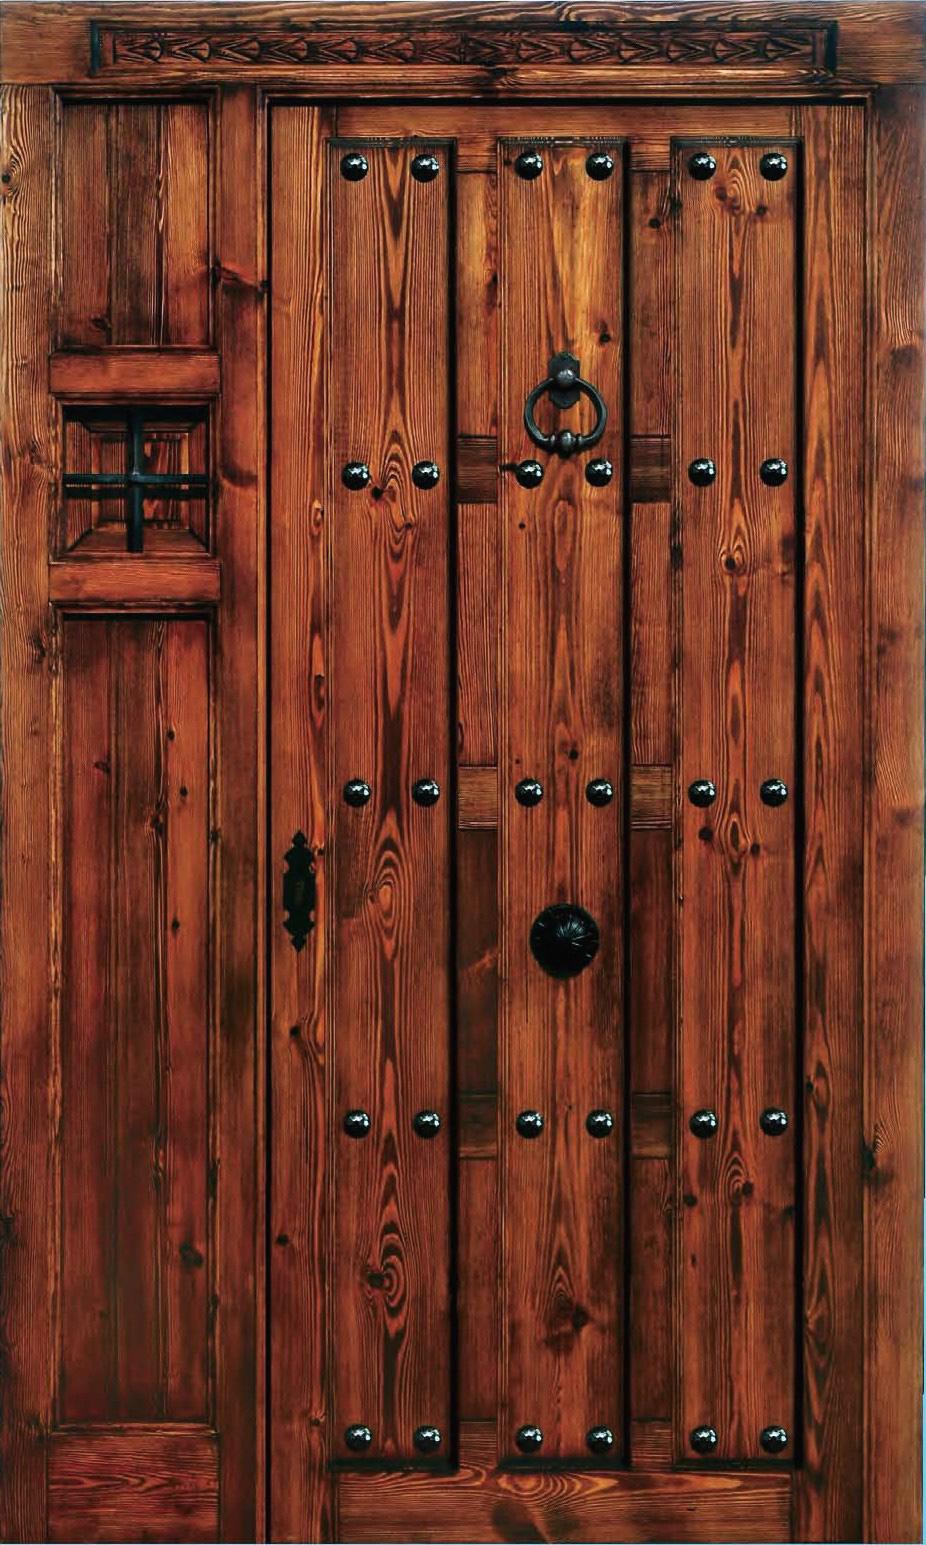 Puerta madera antigua puerta de madera antigua imagenes - Puertas usadas de madera ...